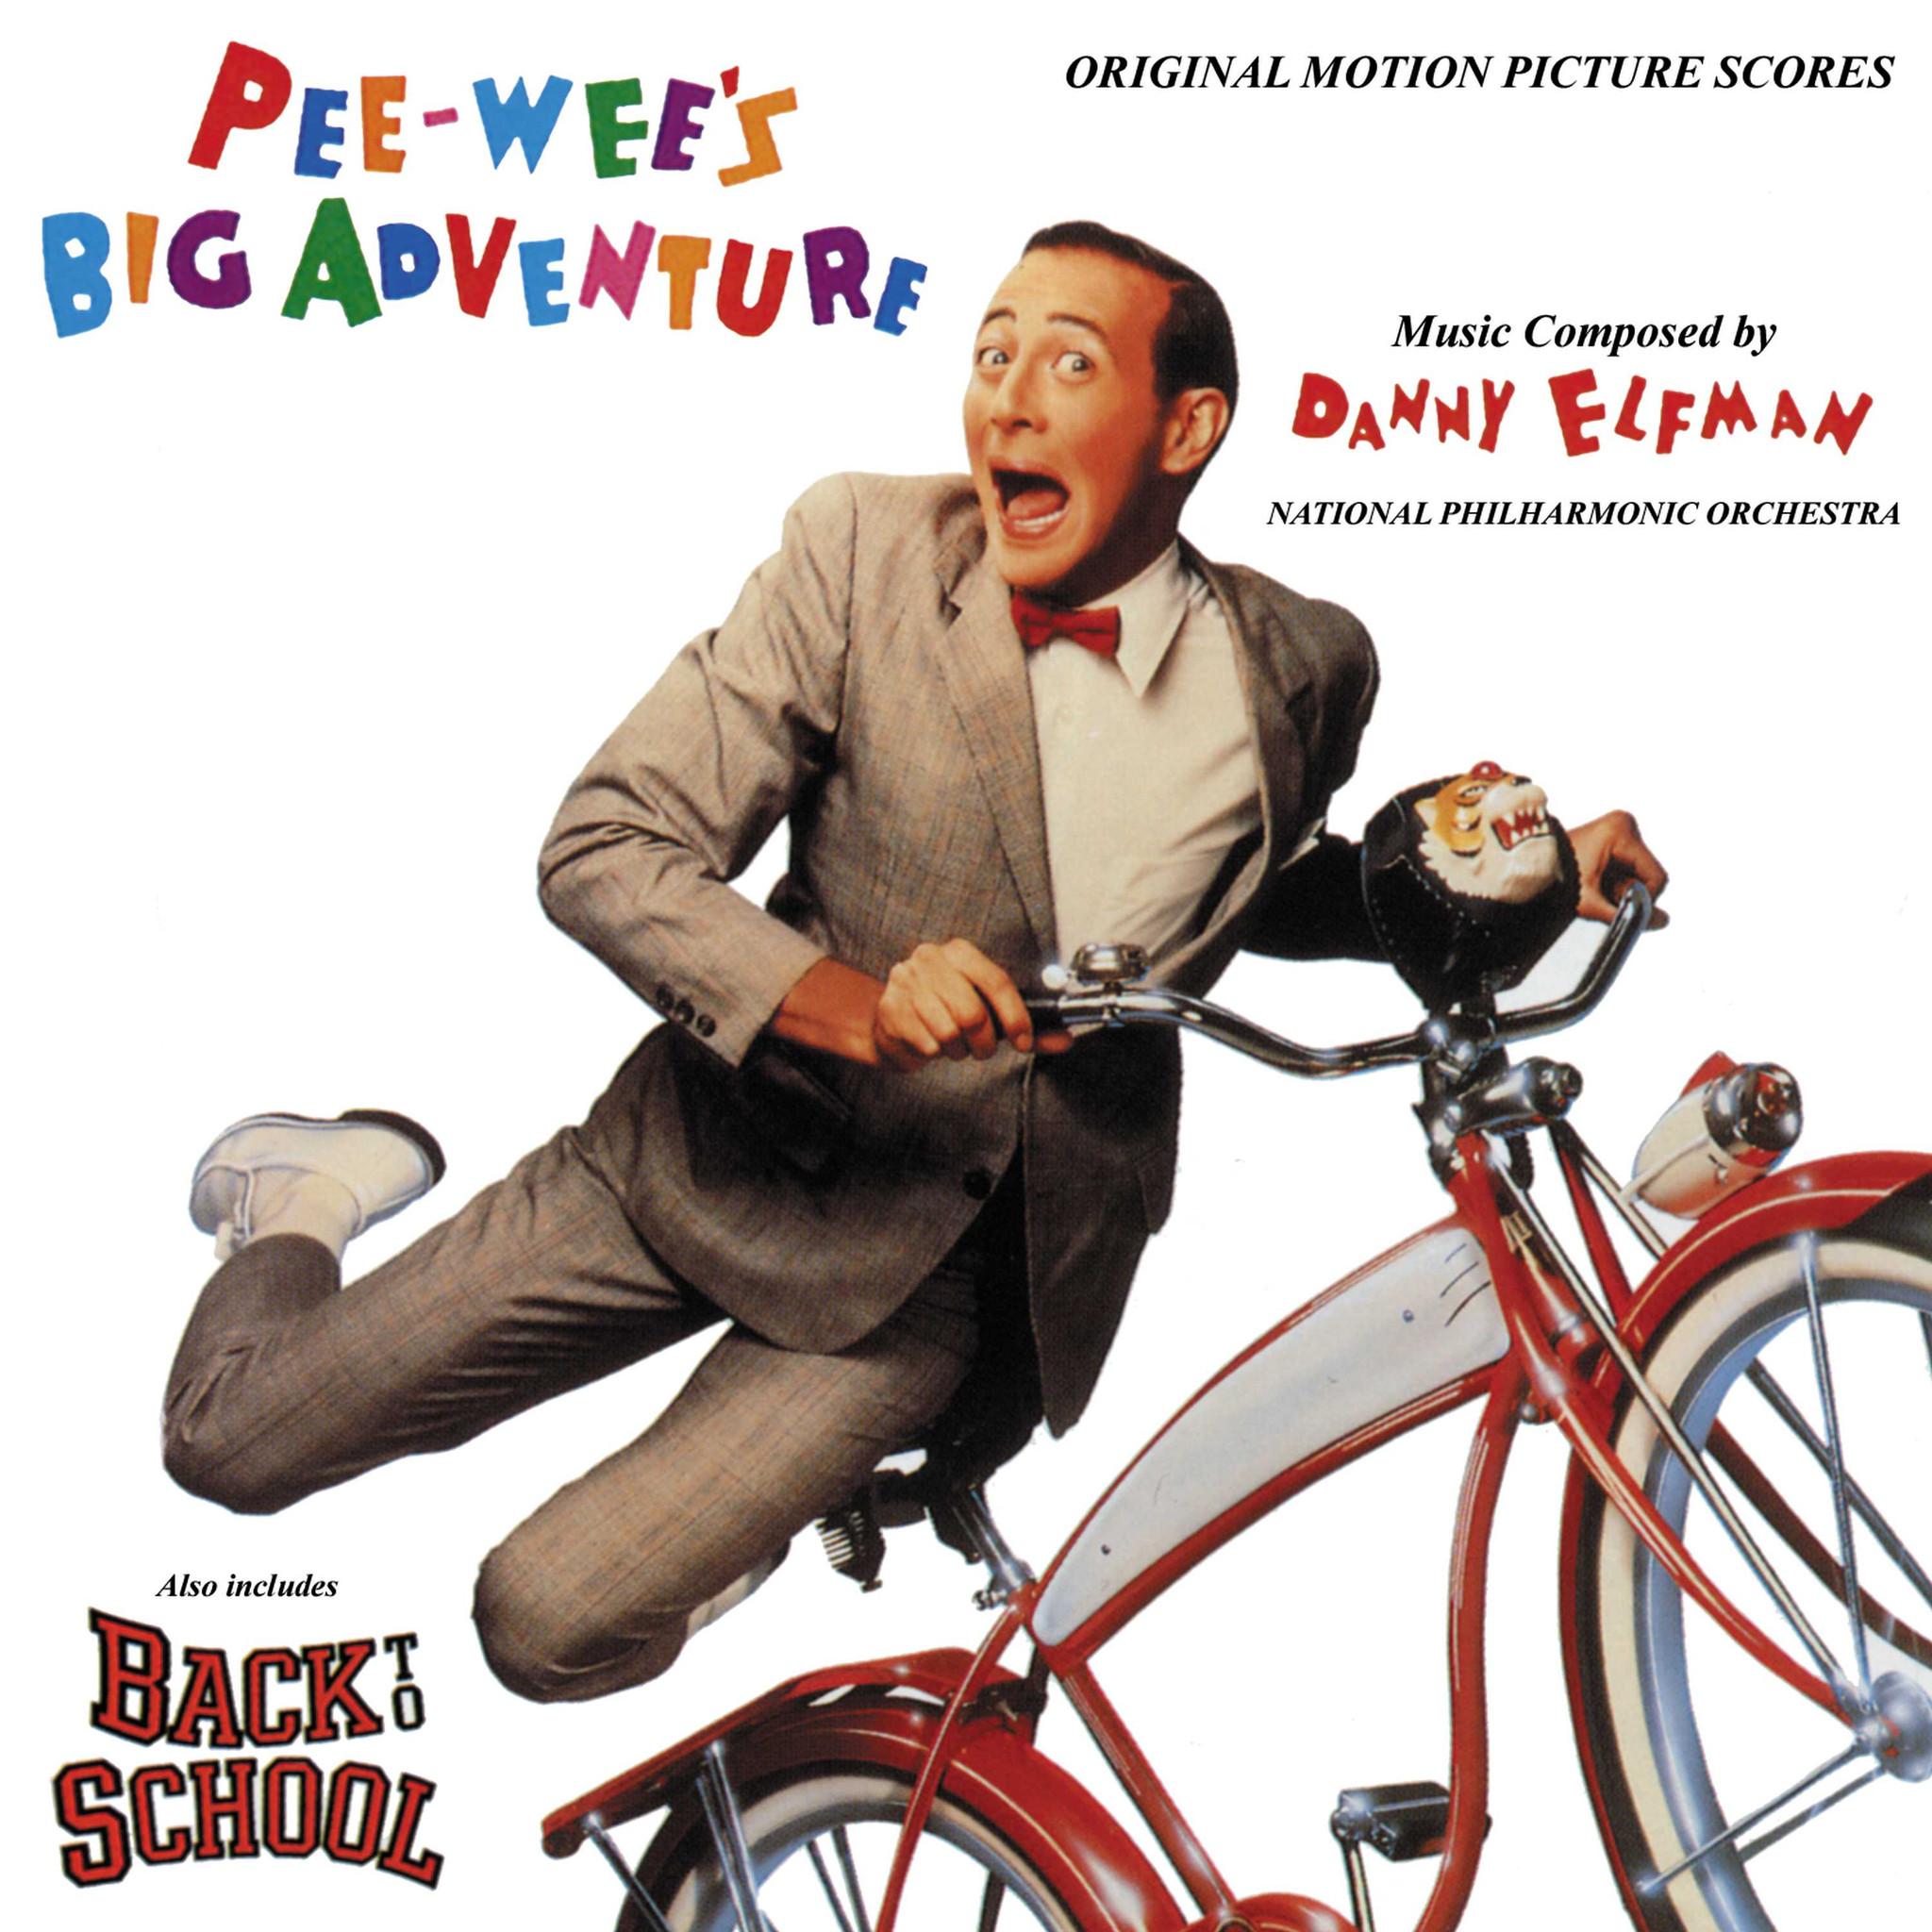 Peewee's Big Adventure / O.s.t. - Peewee's Big Adventure / O.s.t. - Musik - SOUNDTRACK / SCORE - 0030206428124 - July 1, 1991